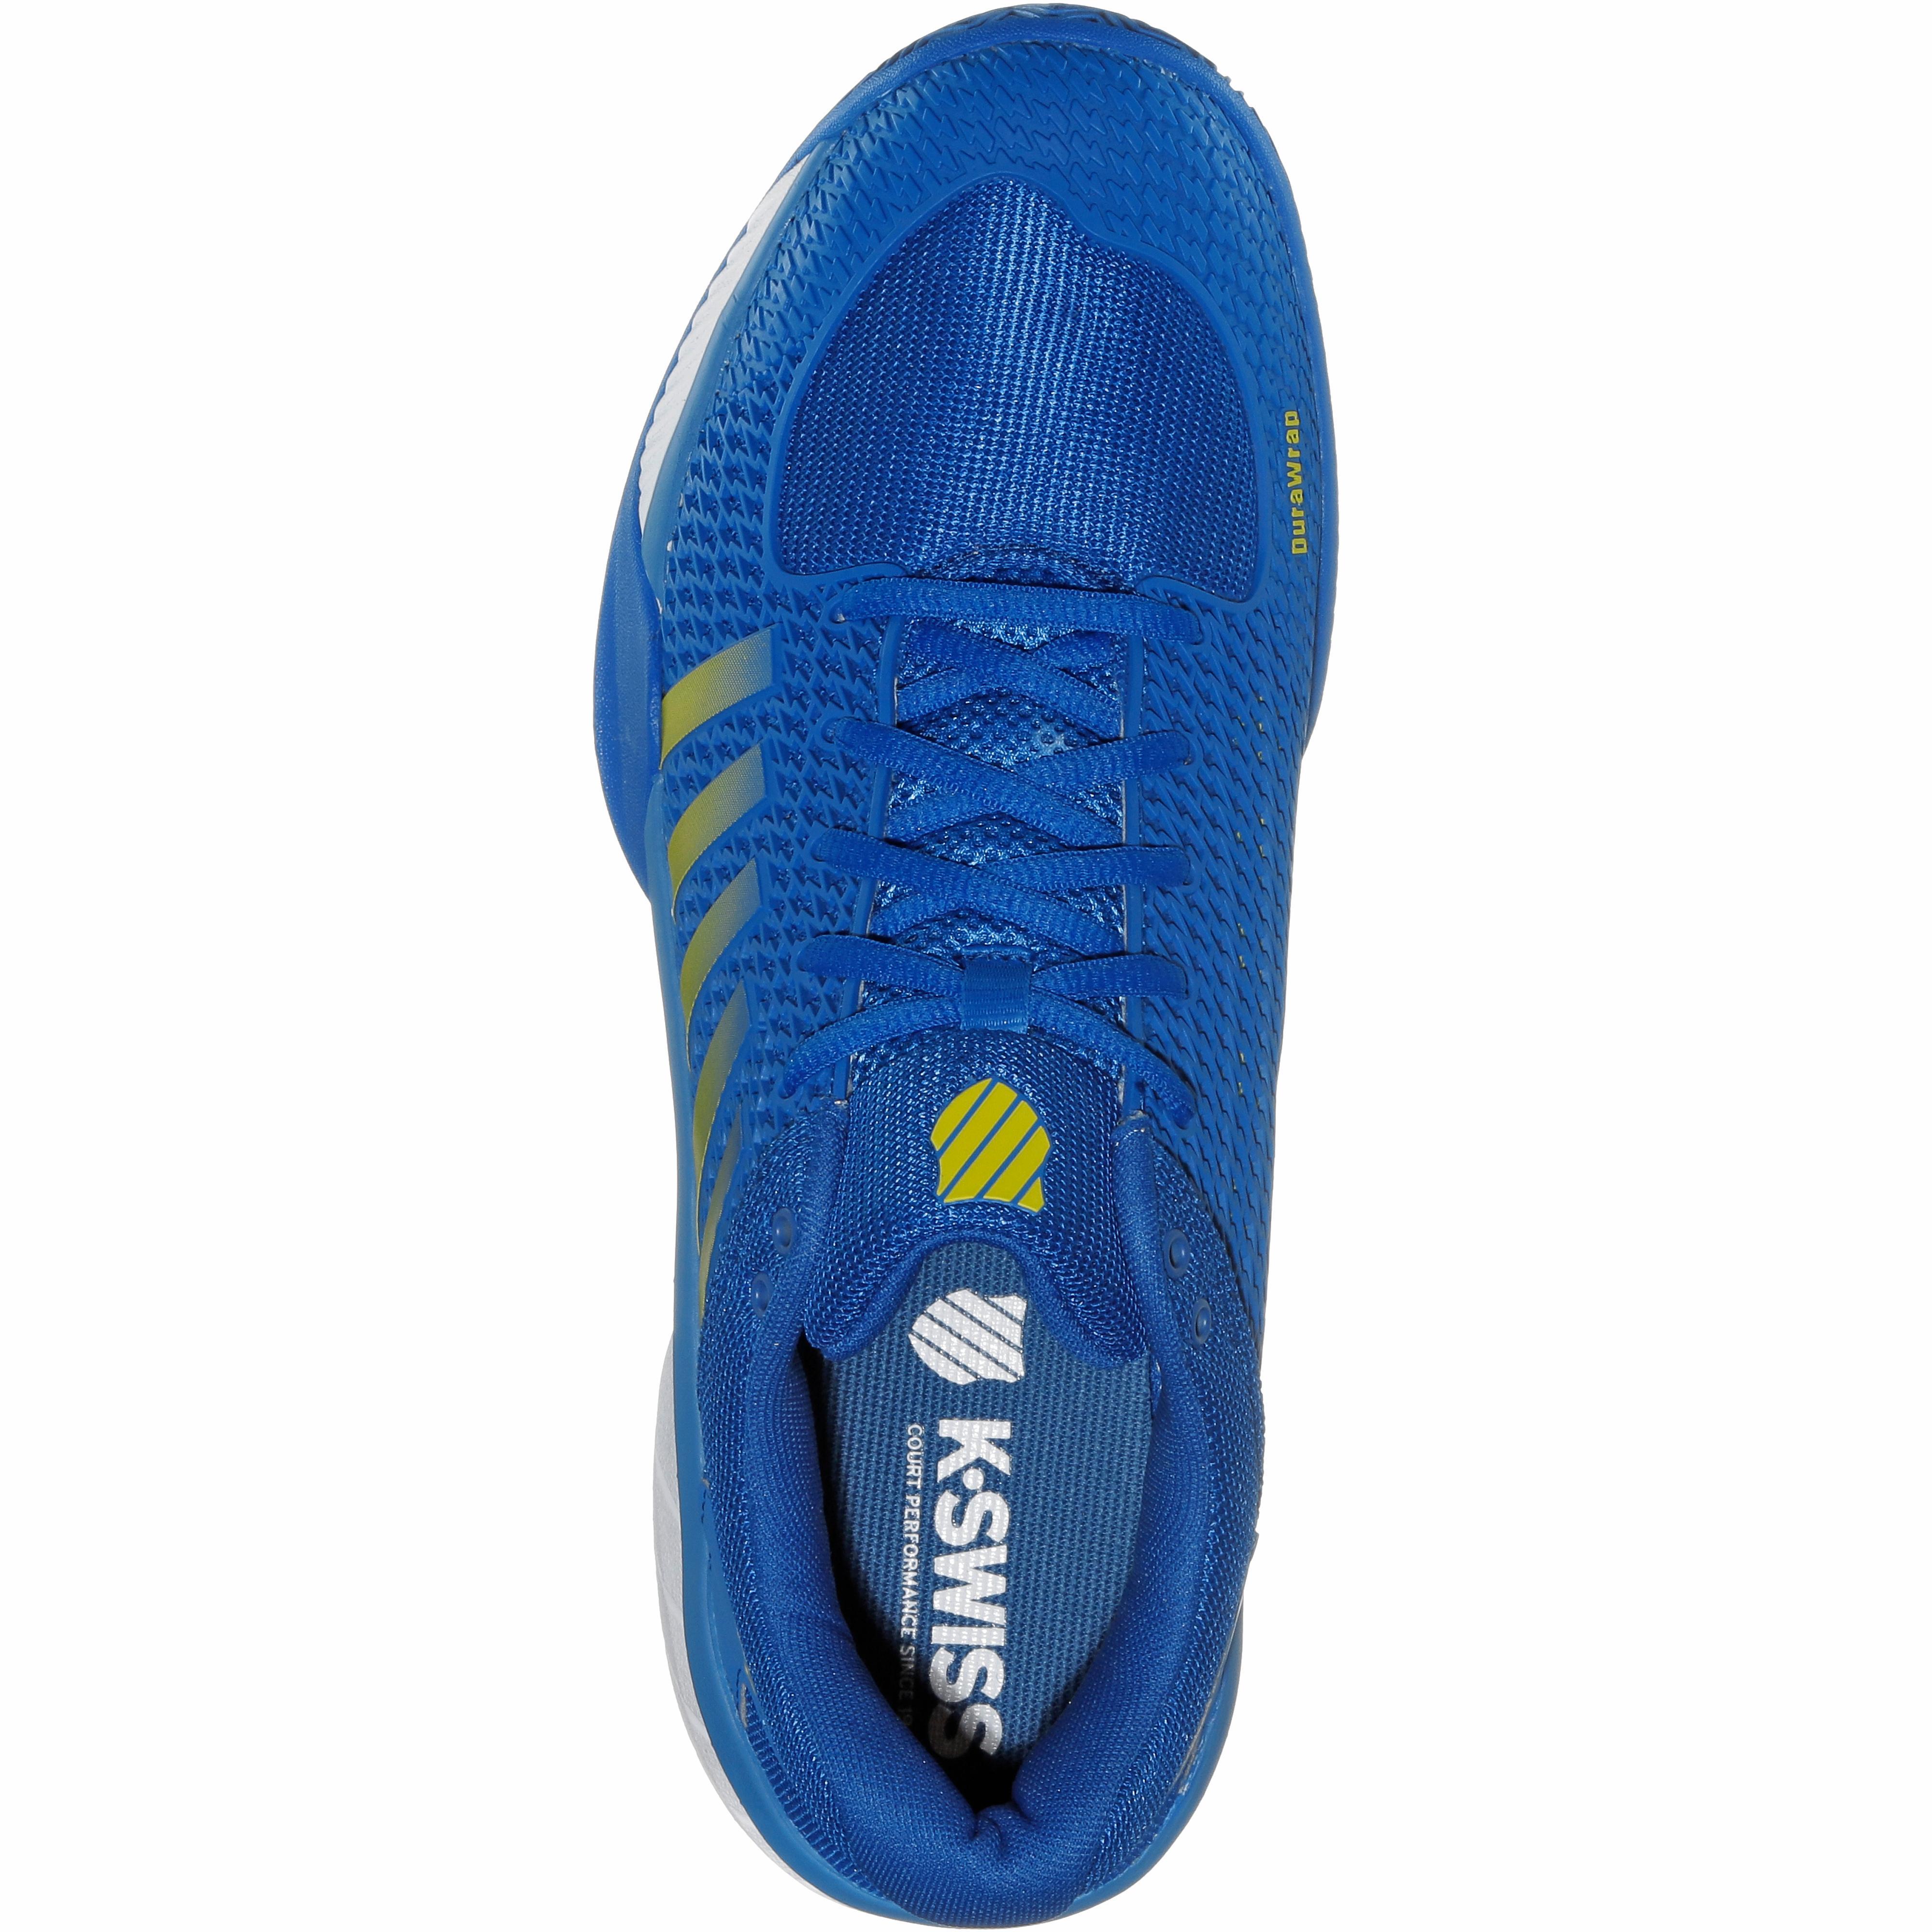 K-Swiss Express Express Express Light Tennisschuhe Herren strong blue-white-neon citron im Online Shop von SportScheck kaufen Gute Qualität beliebte Schuhe 79b1f8